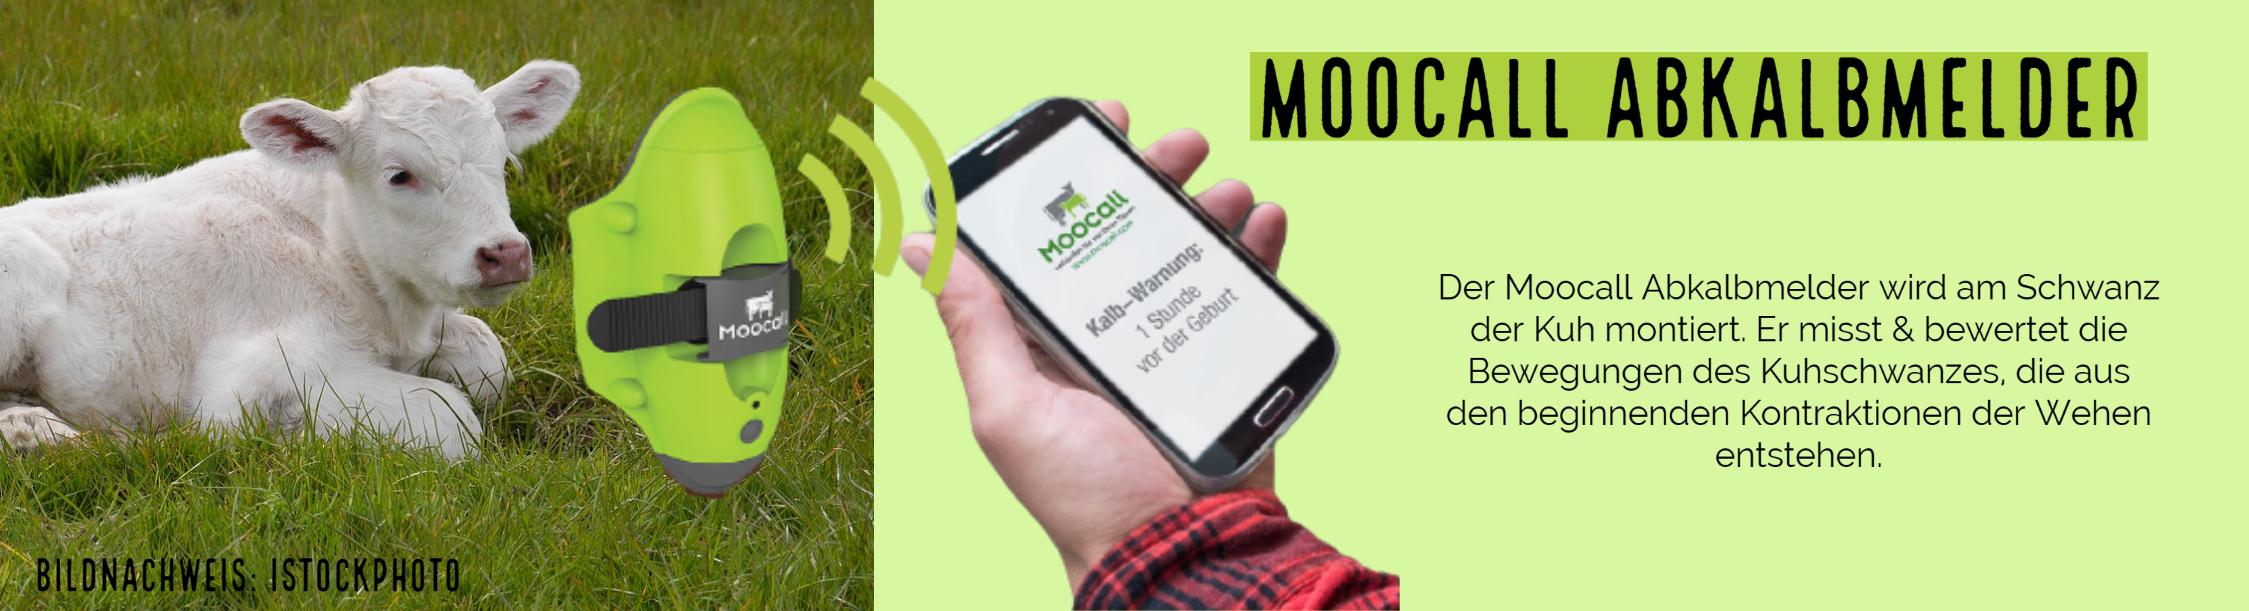 MooCall